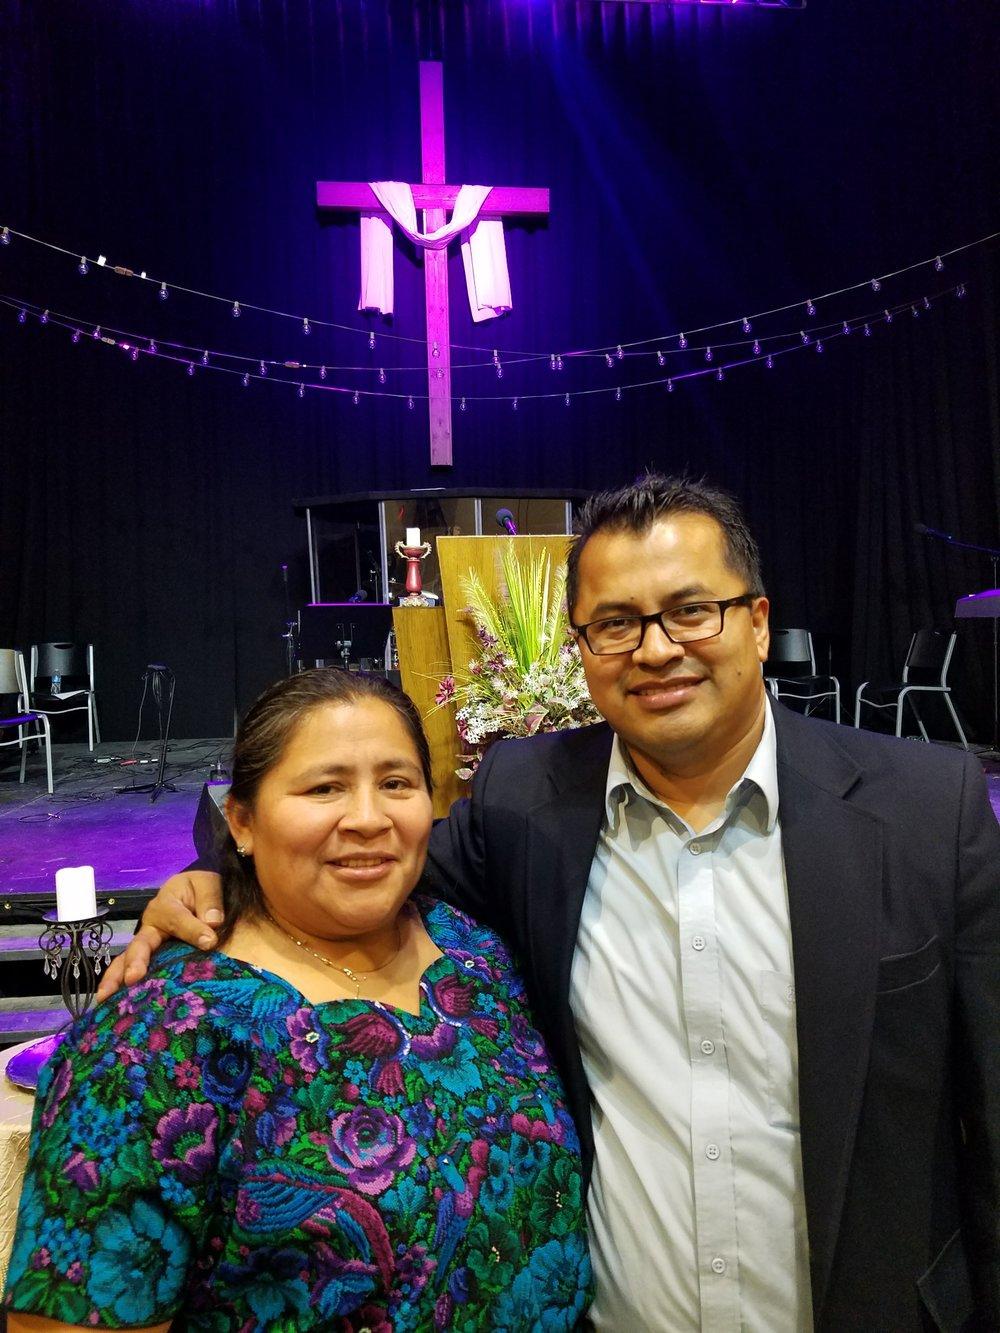 Pastor Herika & husband, Pastor Rudy Larios